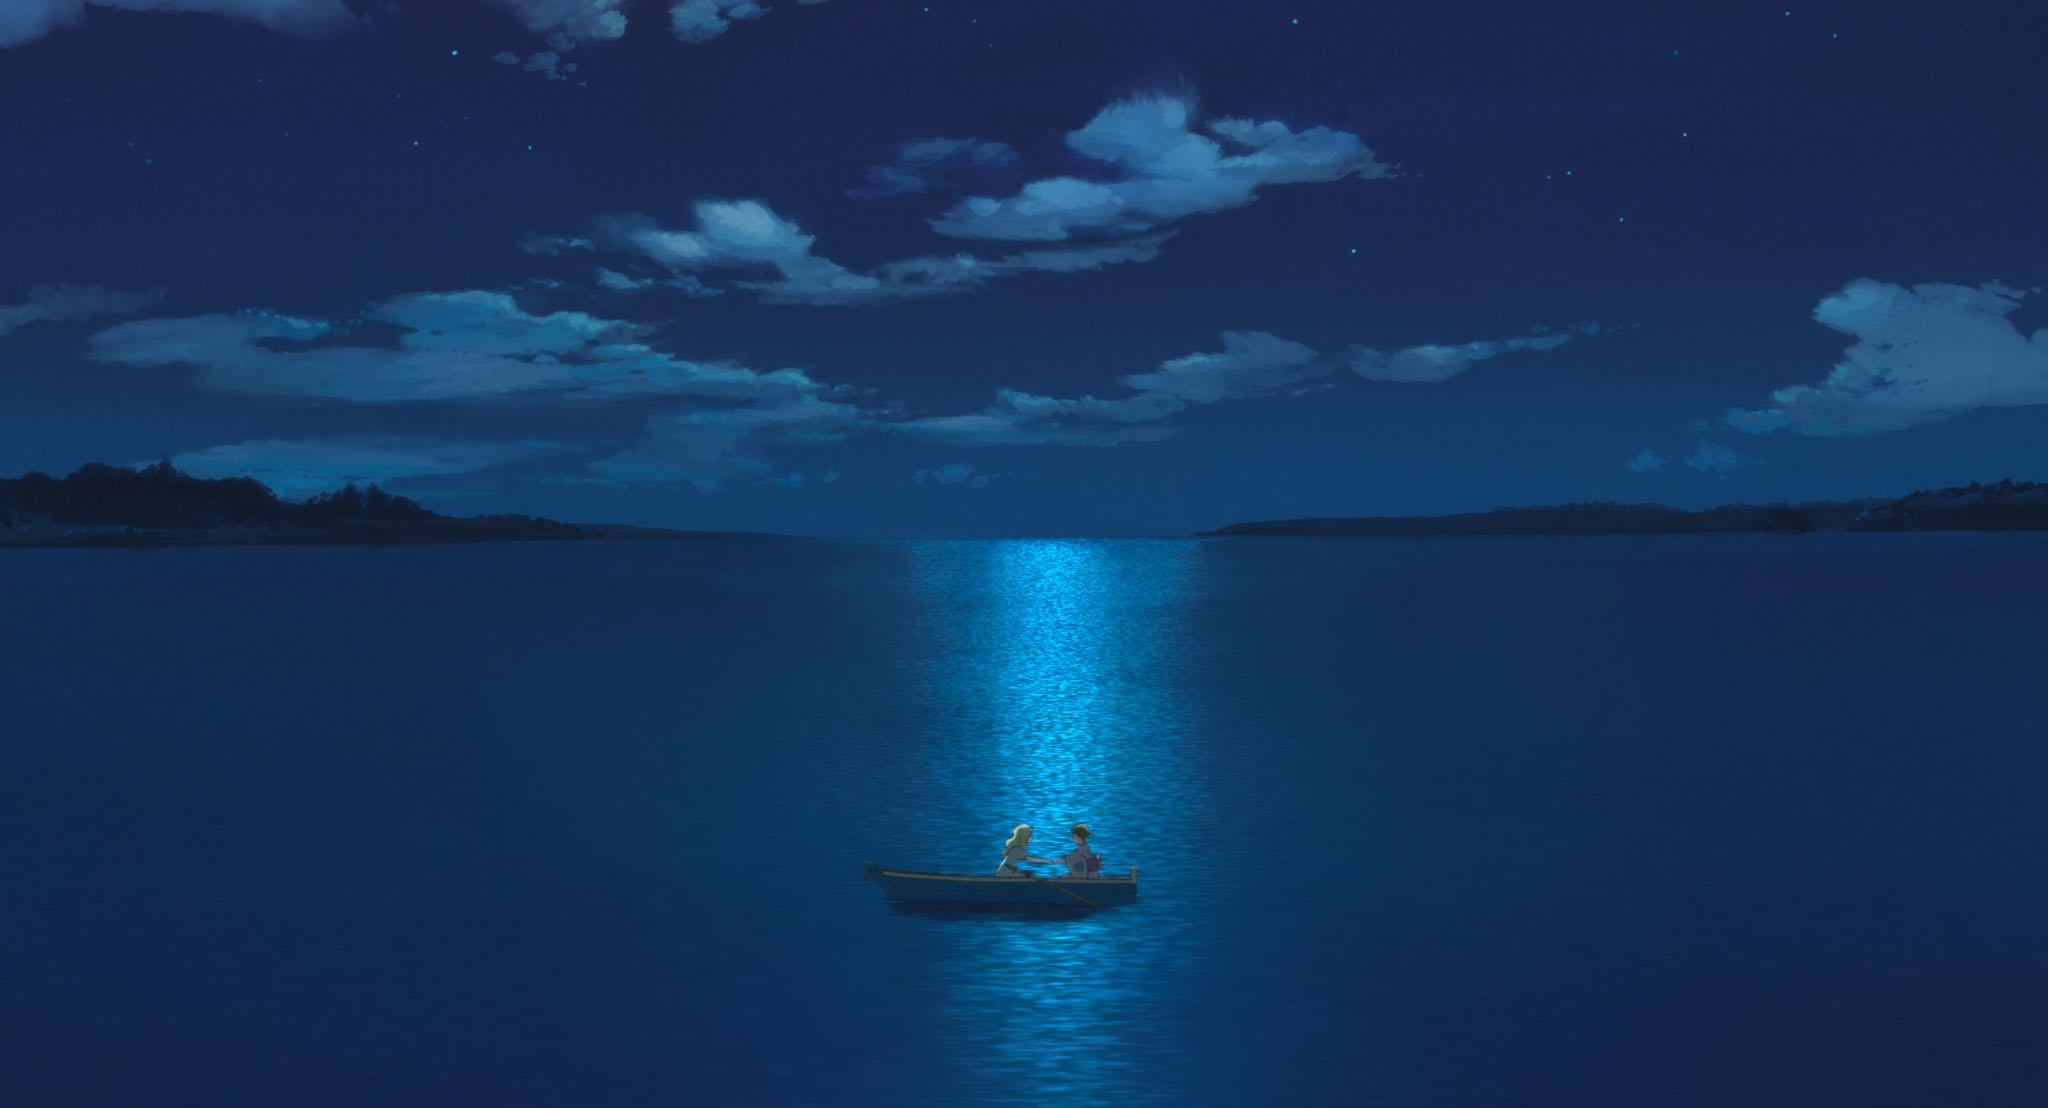 Souvenirs de Marnie (critique) : la paralysie Ghibli